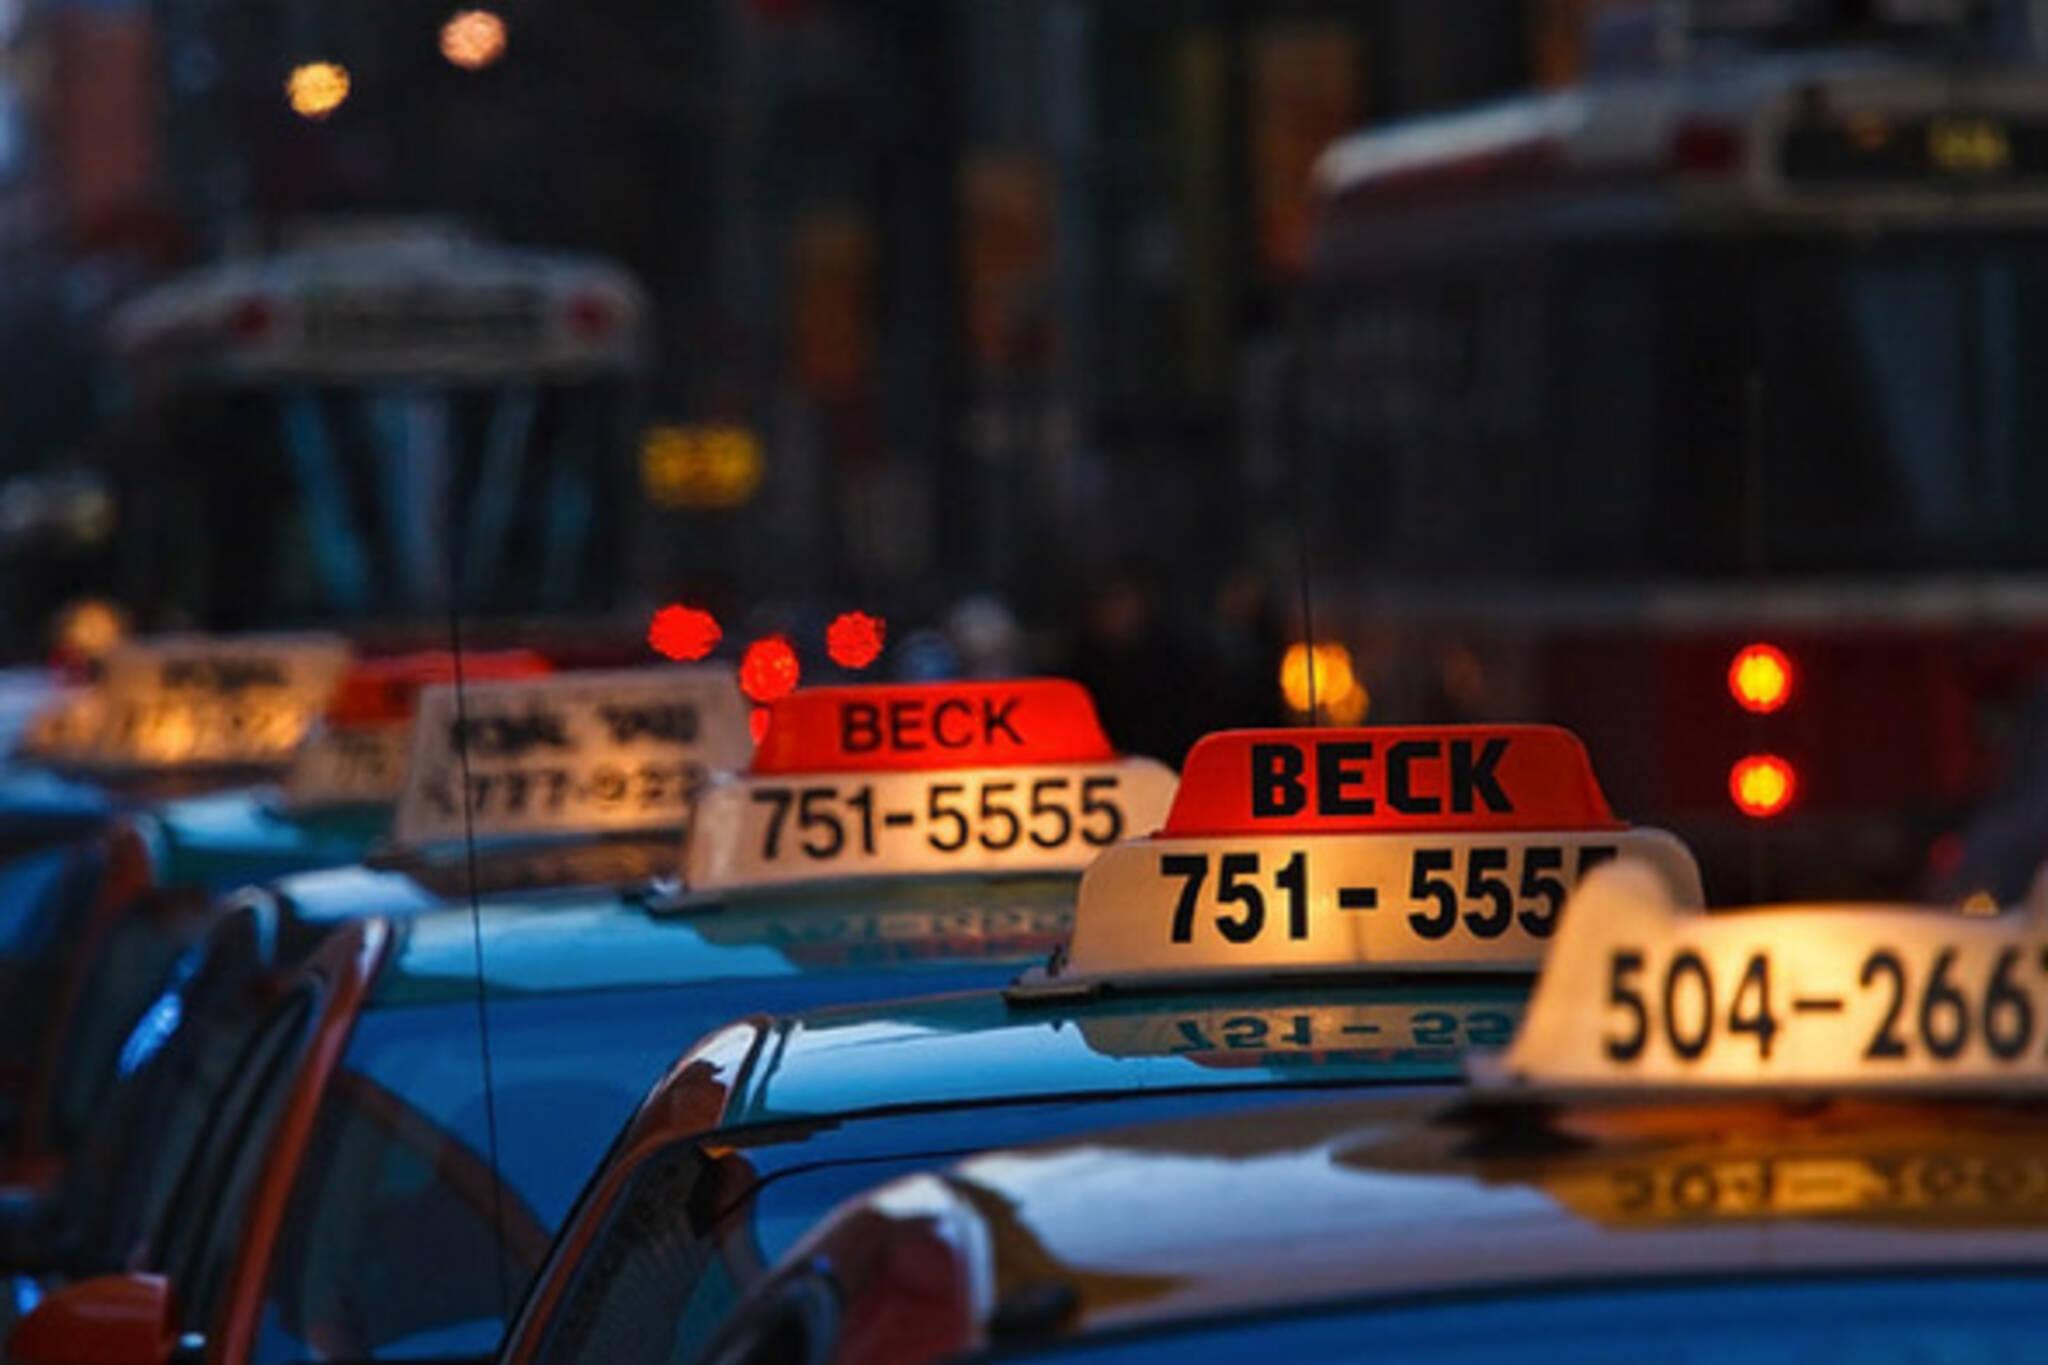 Best Toronto Taxi Company